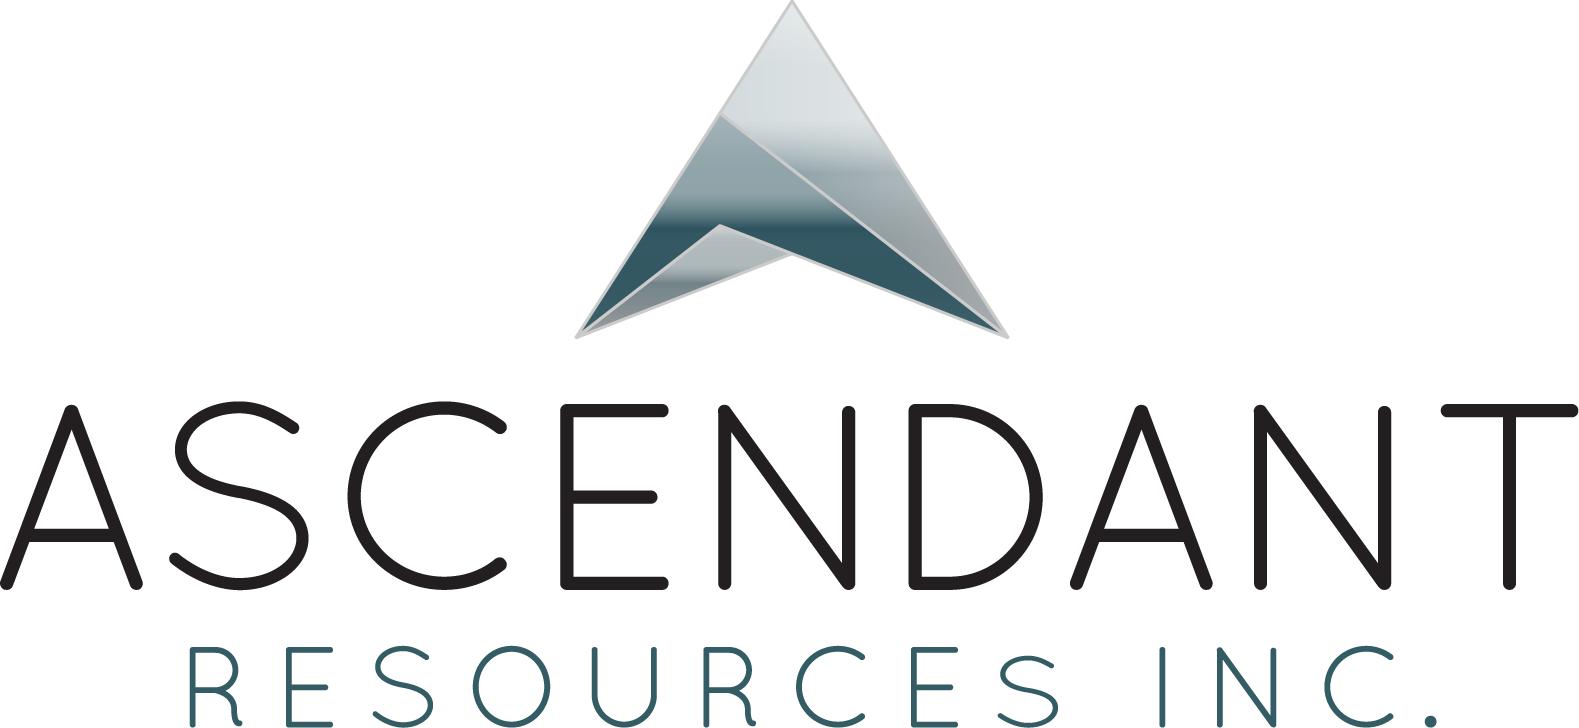 Ascendant Resources Files Technical Report For The Preliminary Economic Assessment For The Lagoa Salgada Project In Portugal